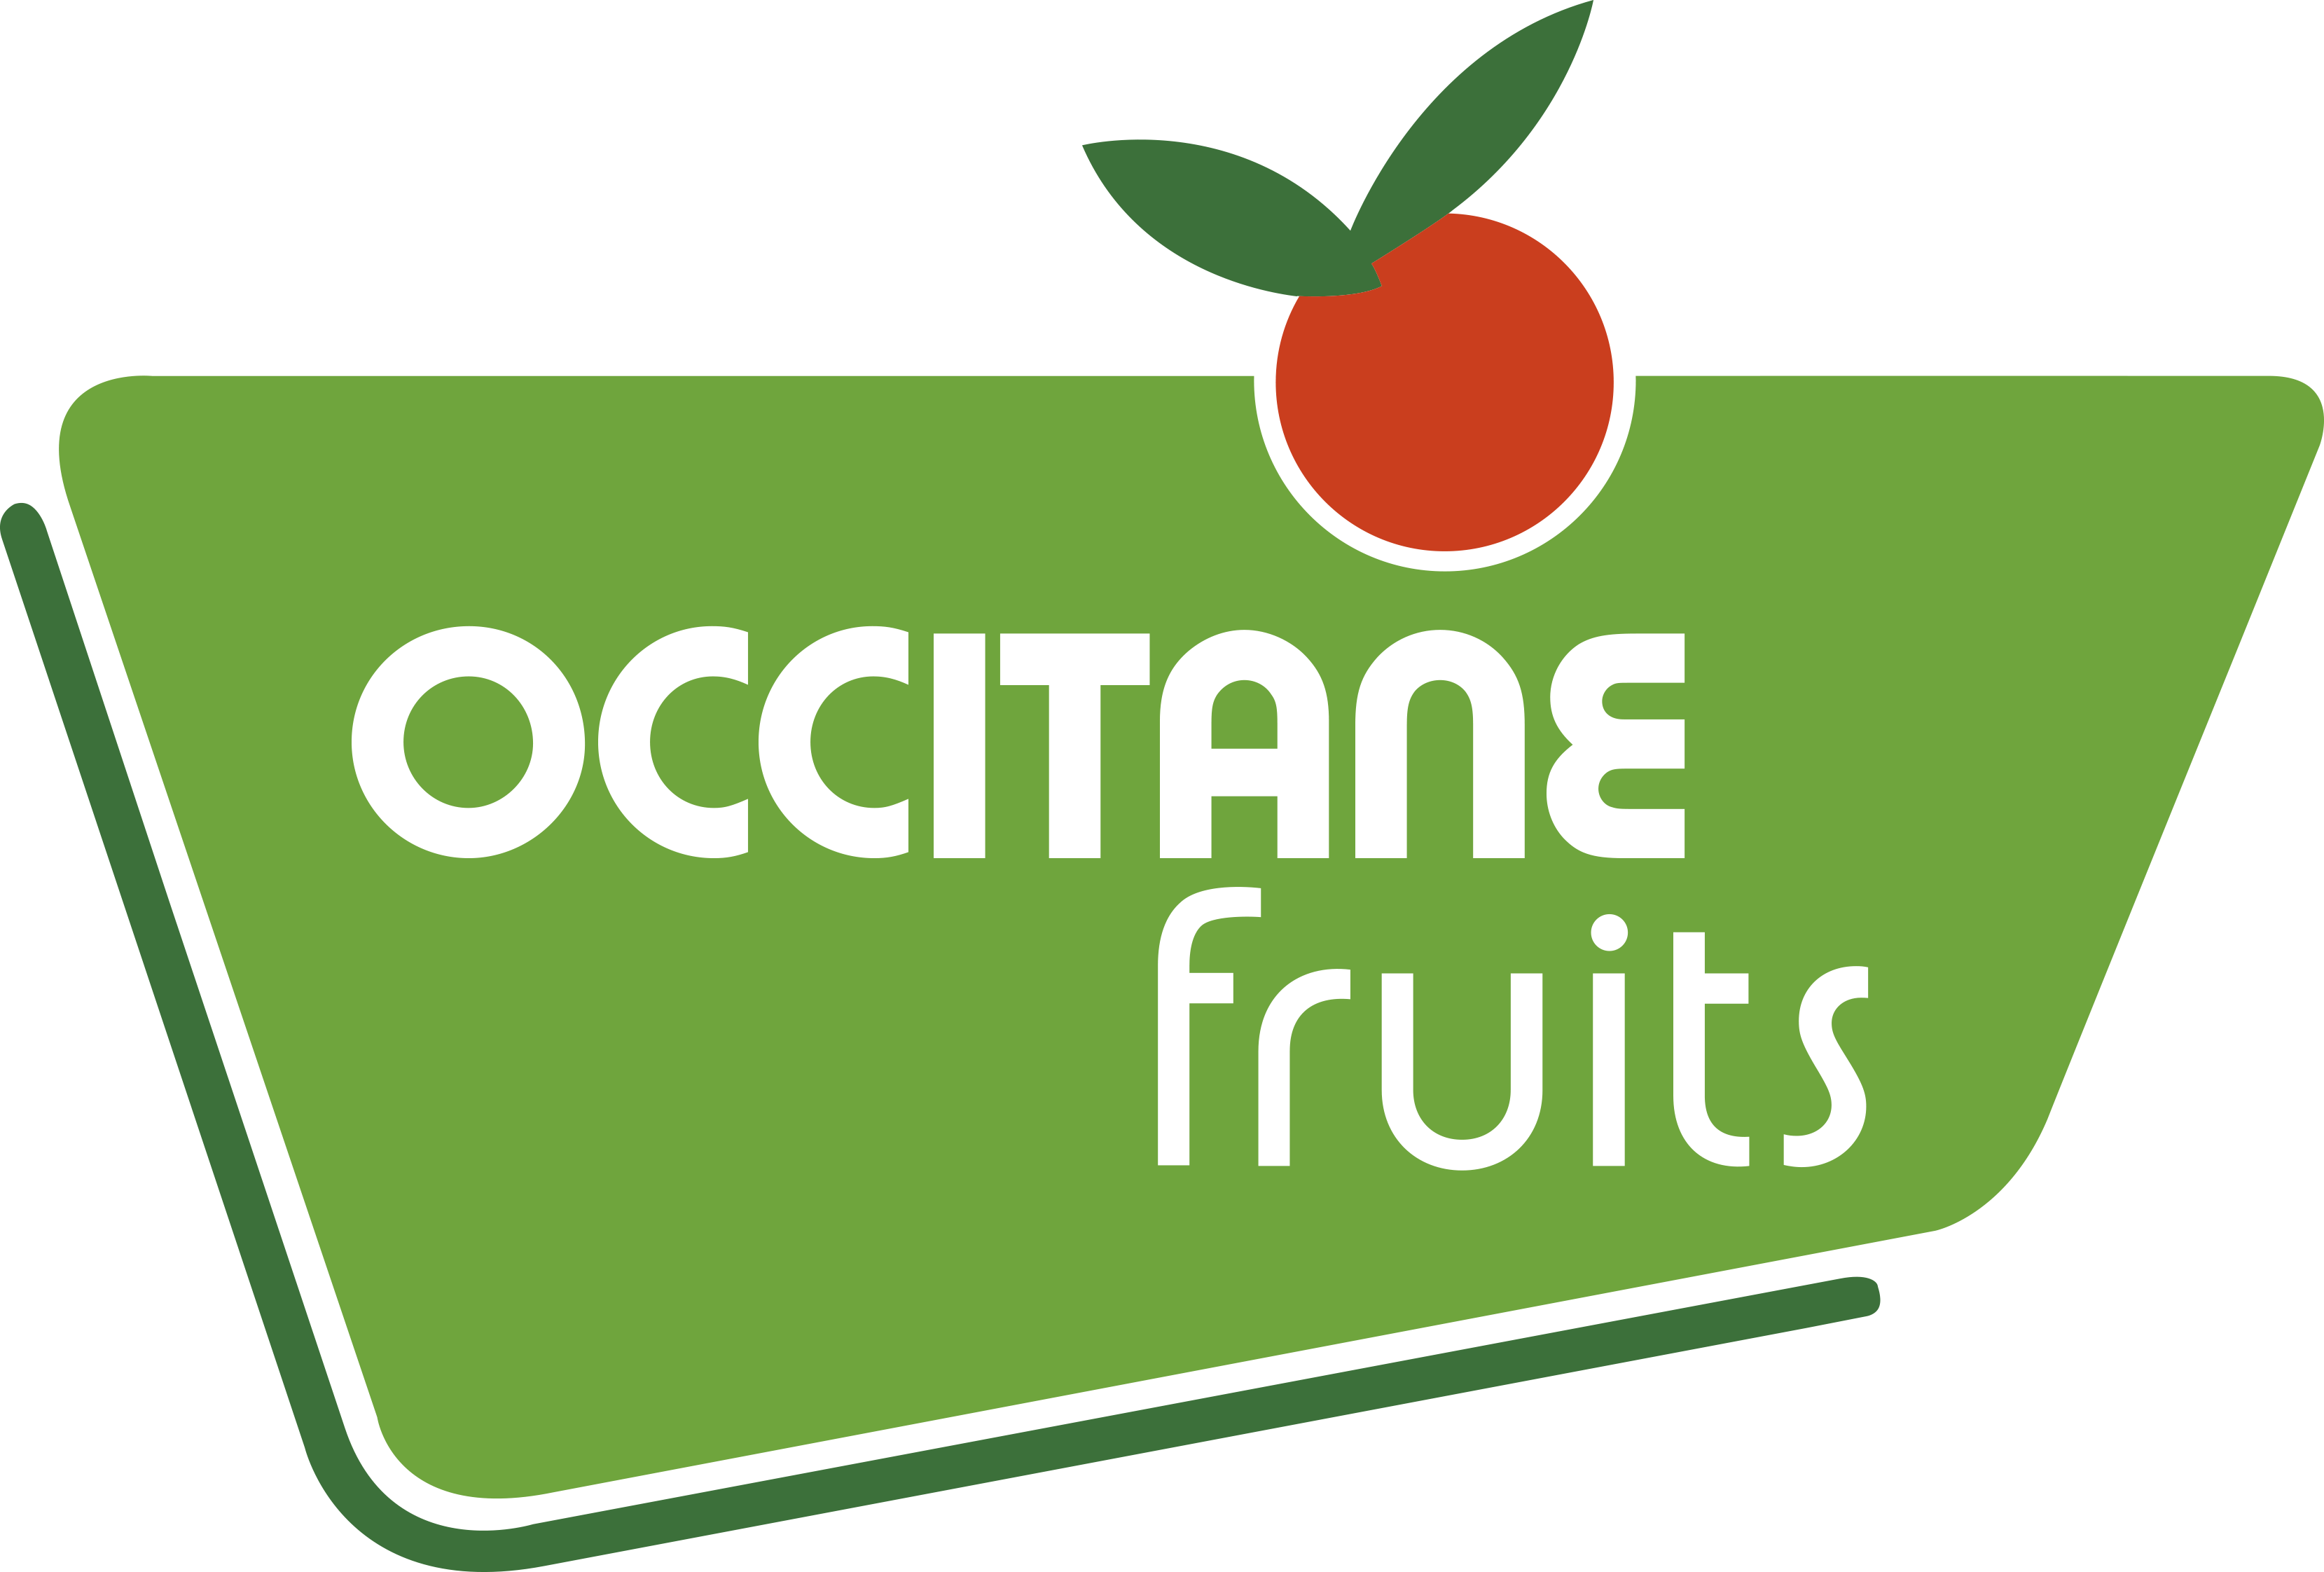 OccitaneFruits_RVB